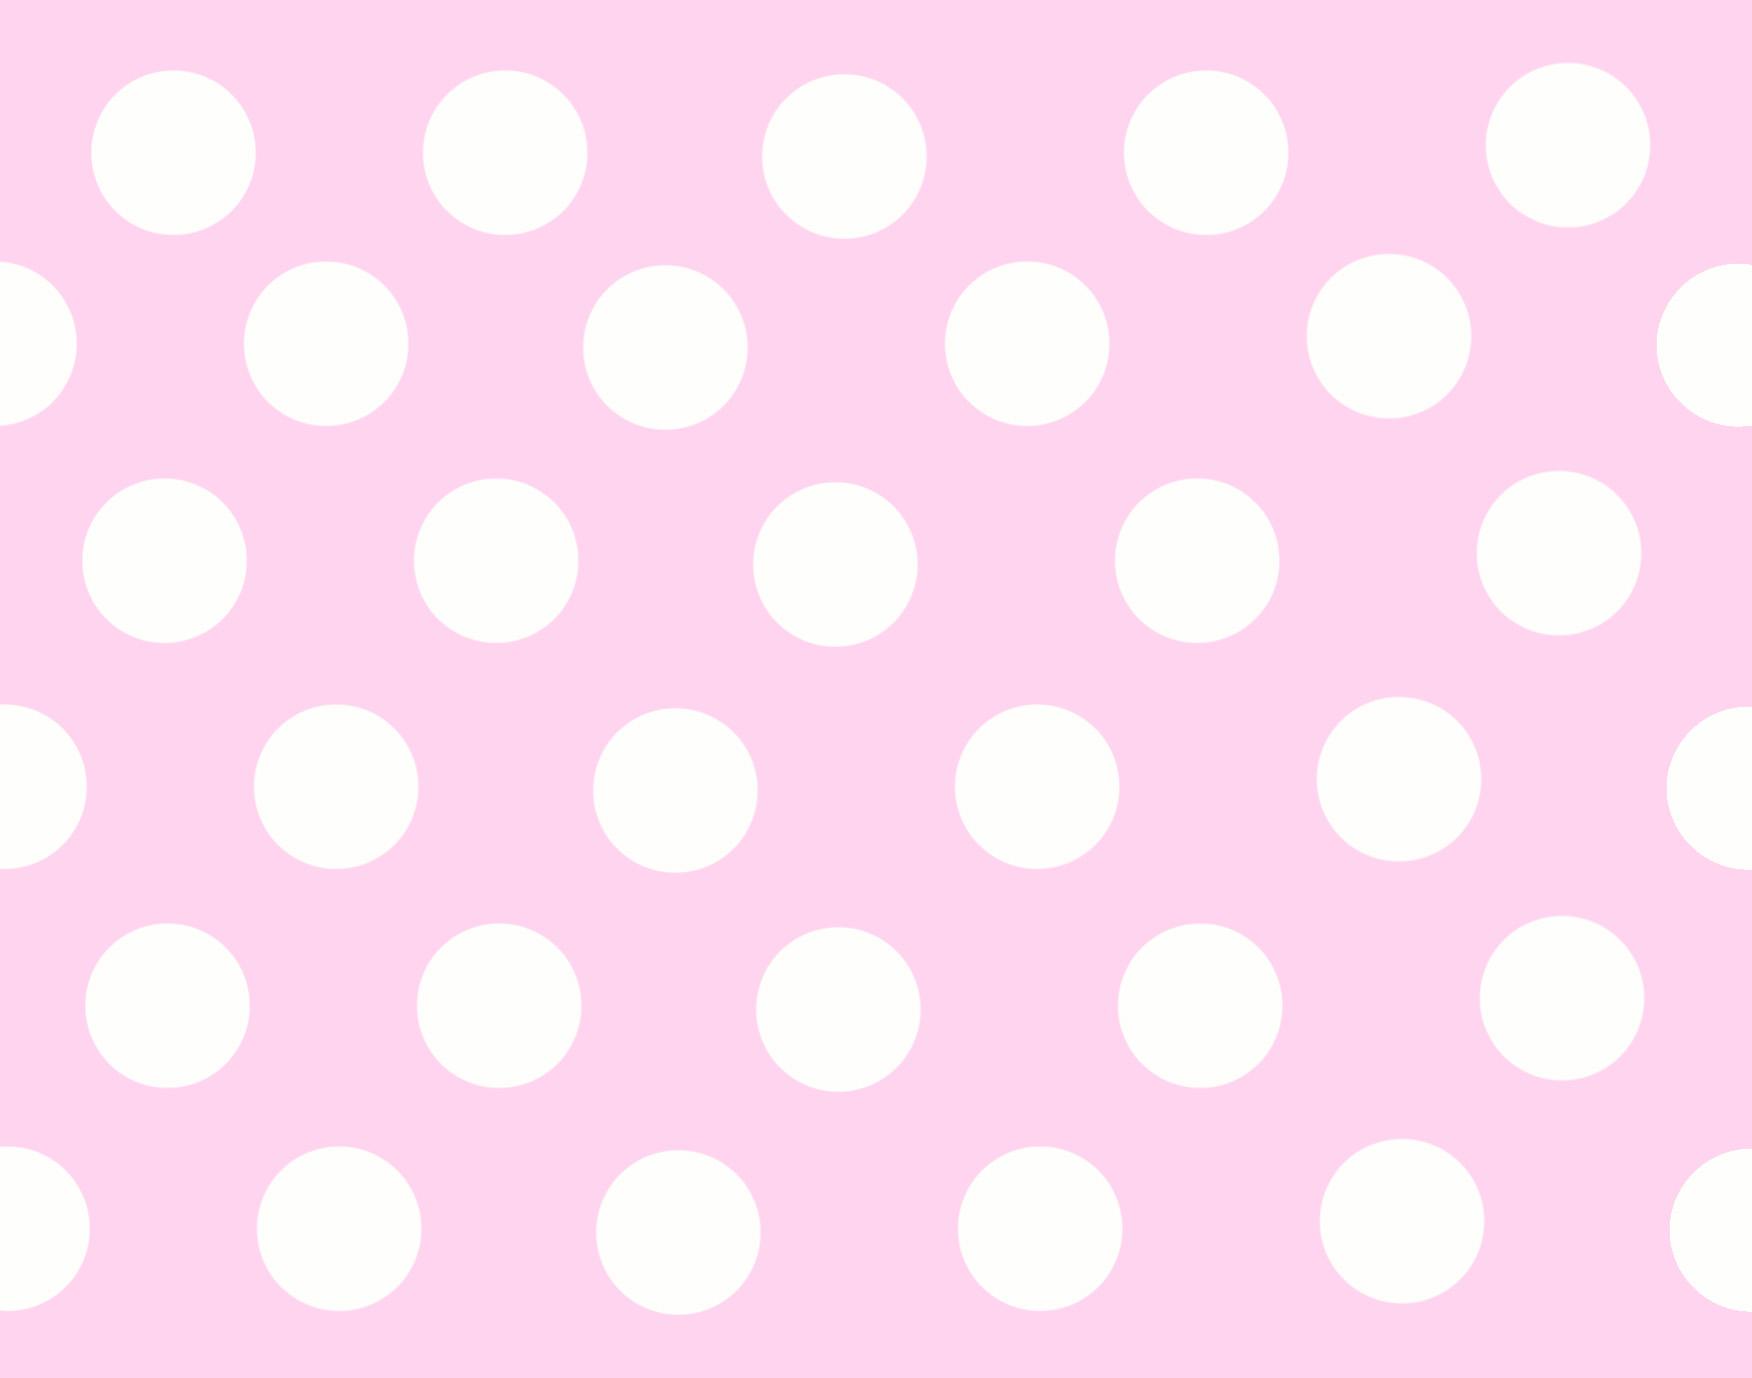 White polka dot wallpaper wallpapersafari for Pink and white wallpaper